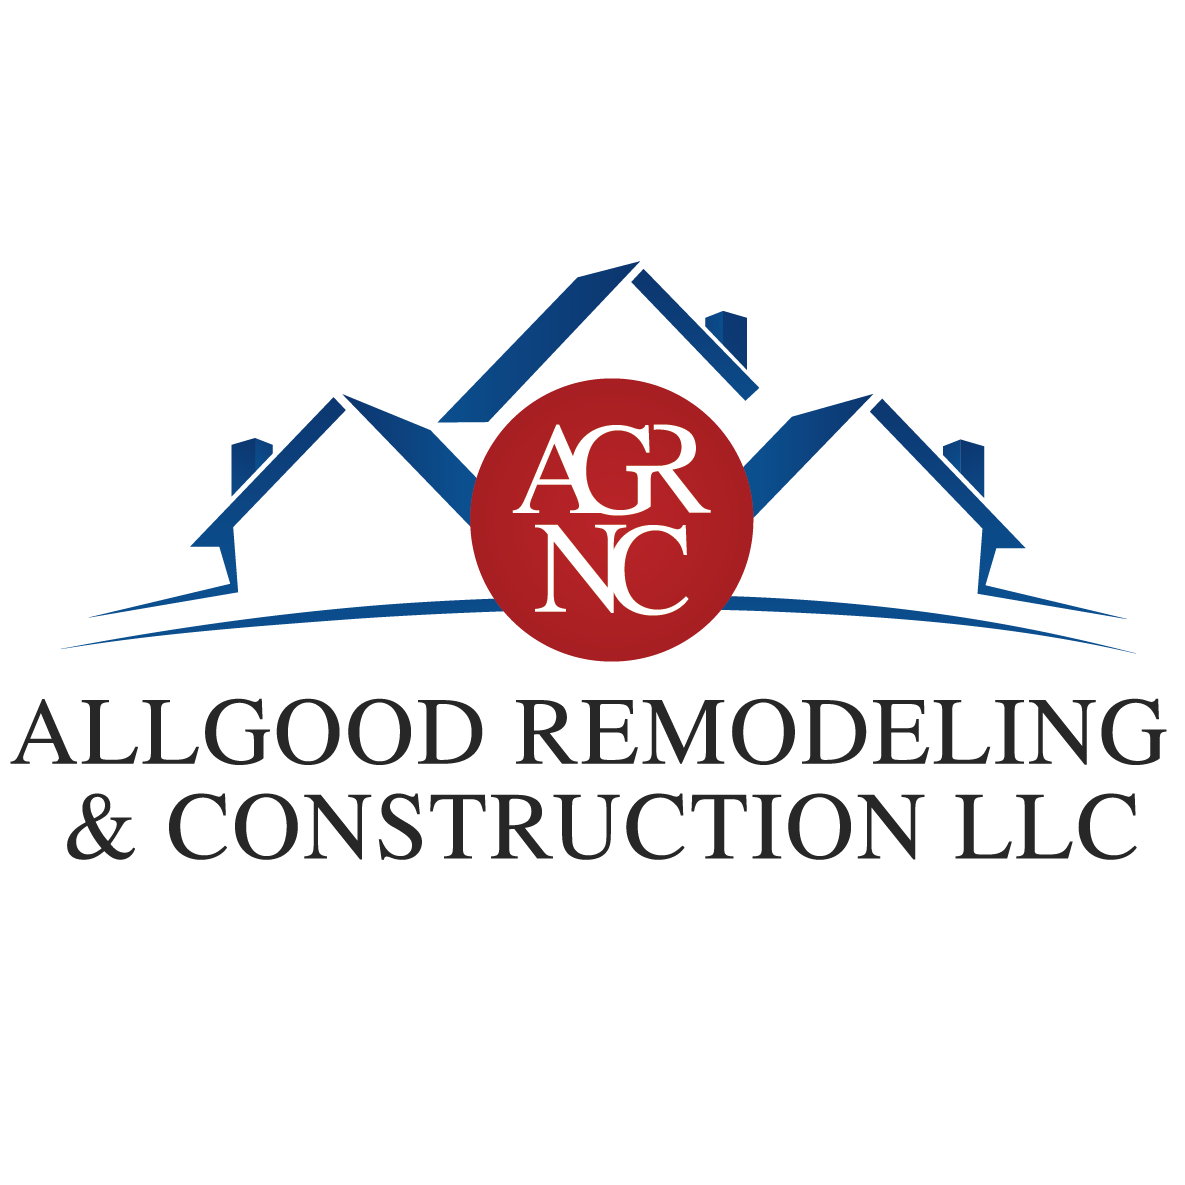 Flooring Services Of Texas Llc : Construction companies near me in houston texas